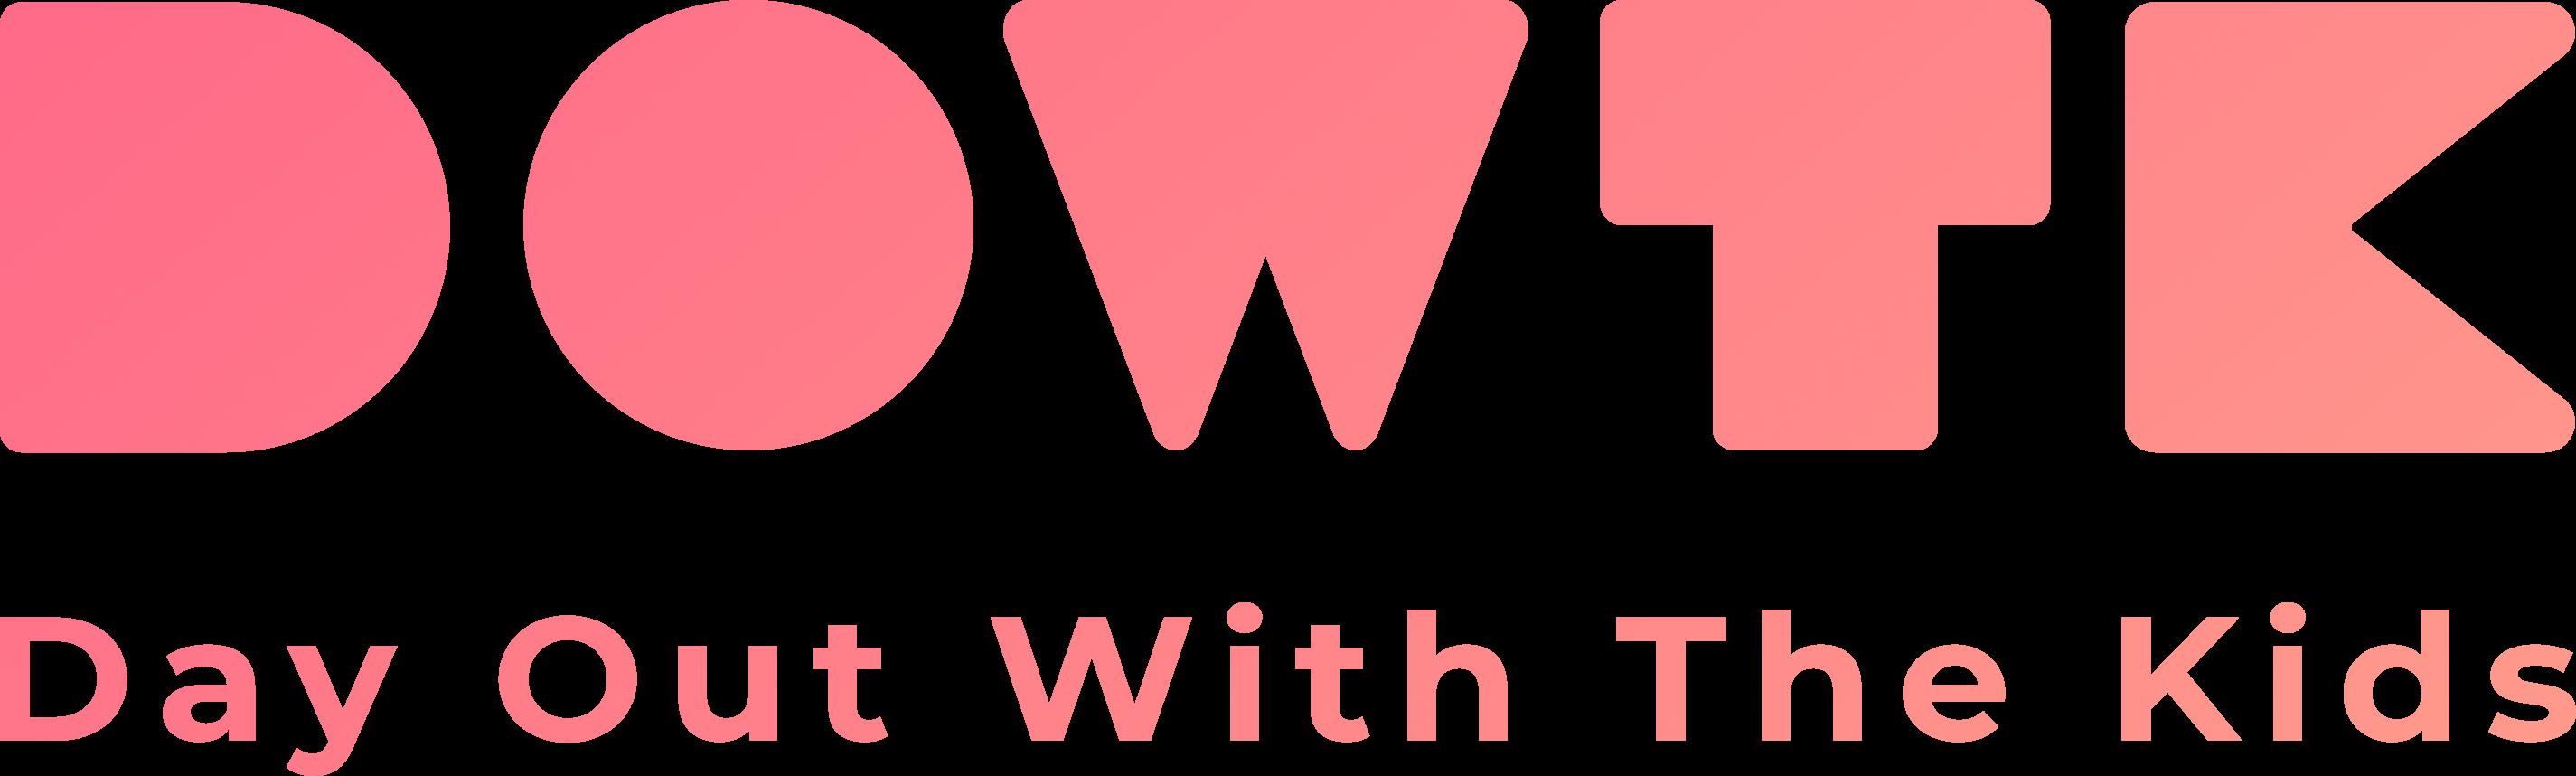 Read DOWTK Reviews